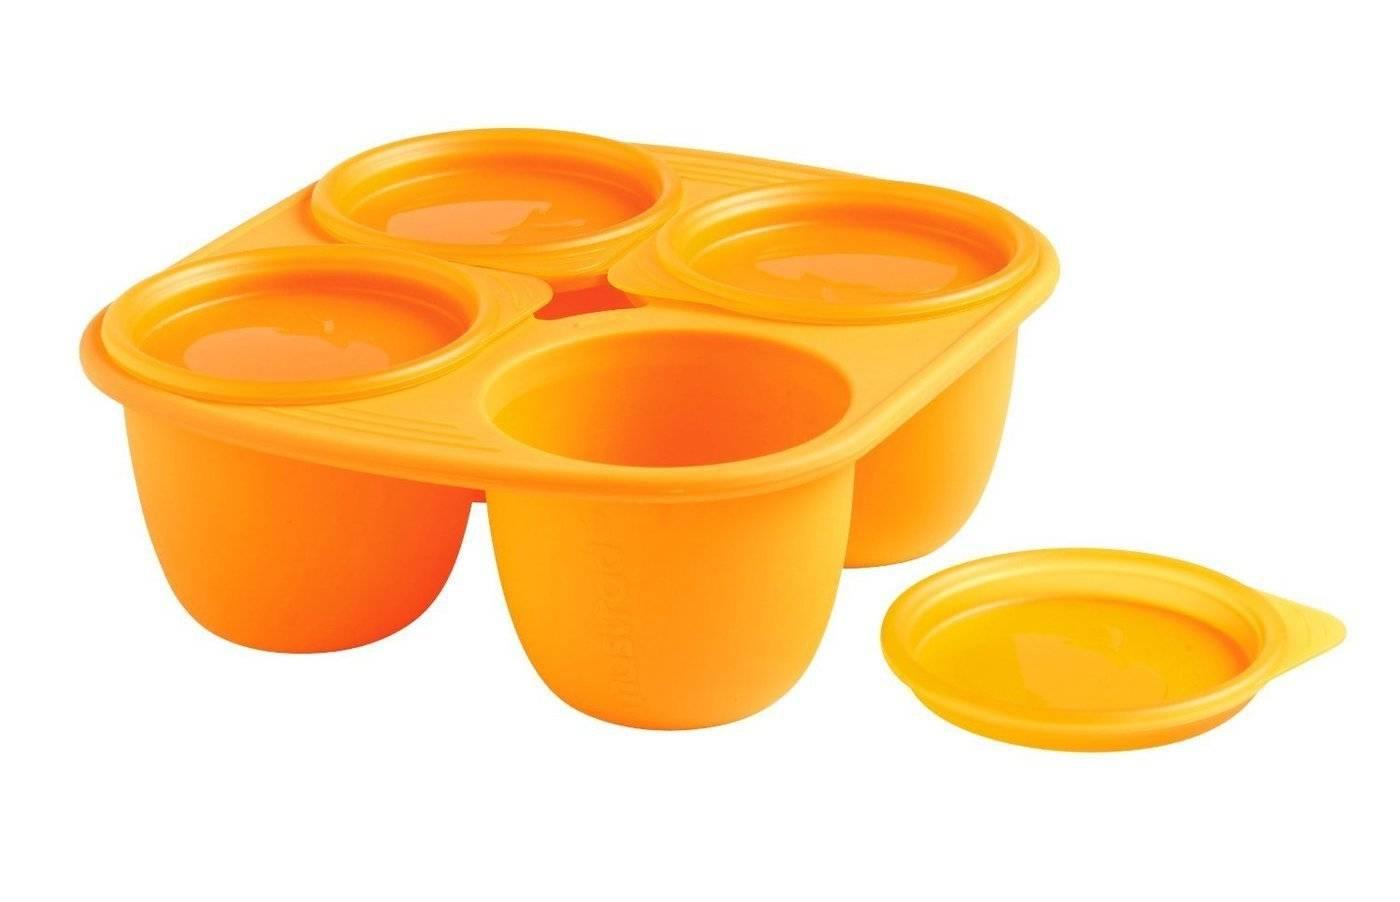 Silikonová miska Mastrad 4 porce oranžová 280ml - Mastrad